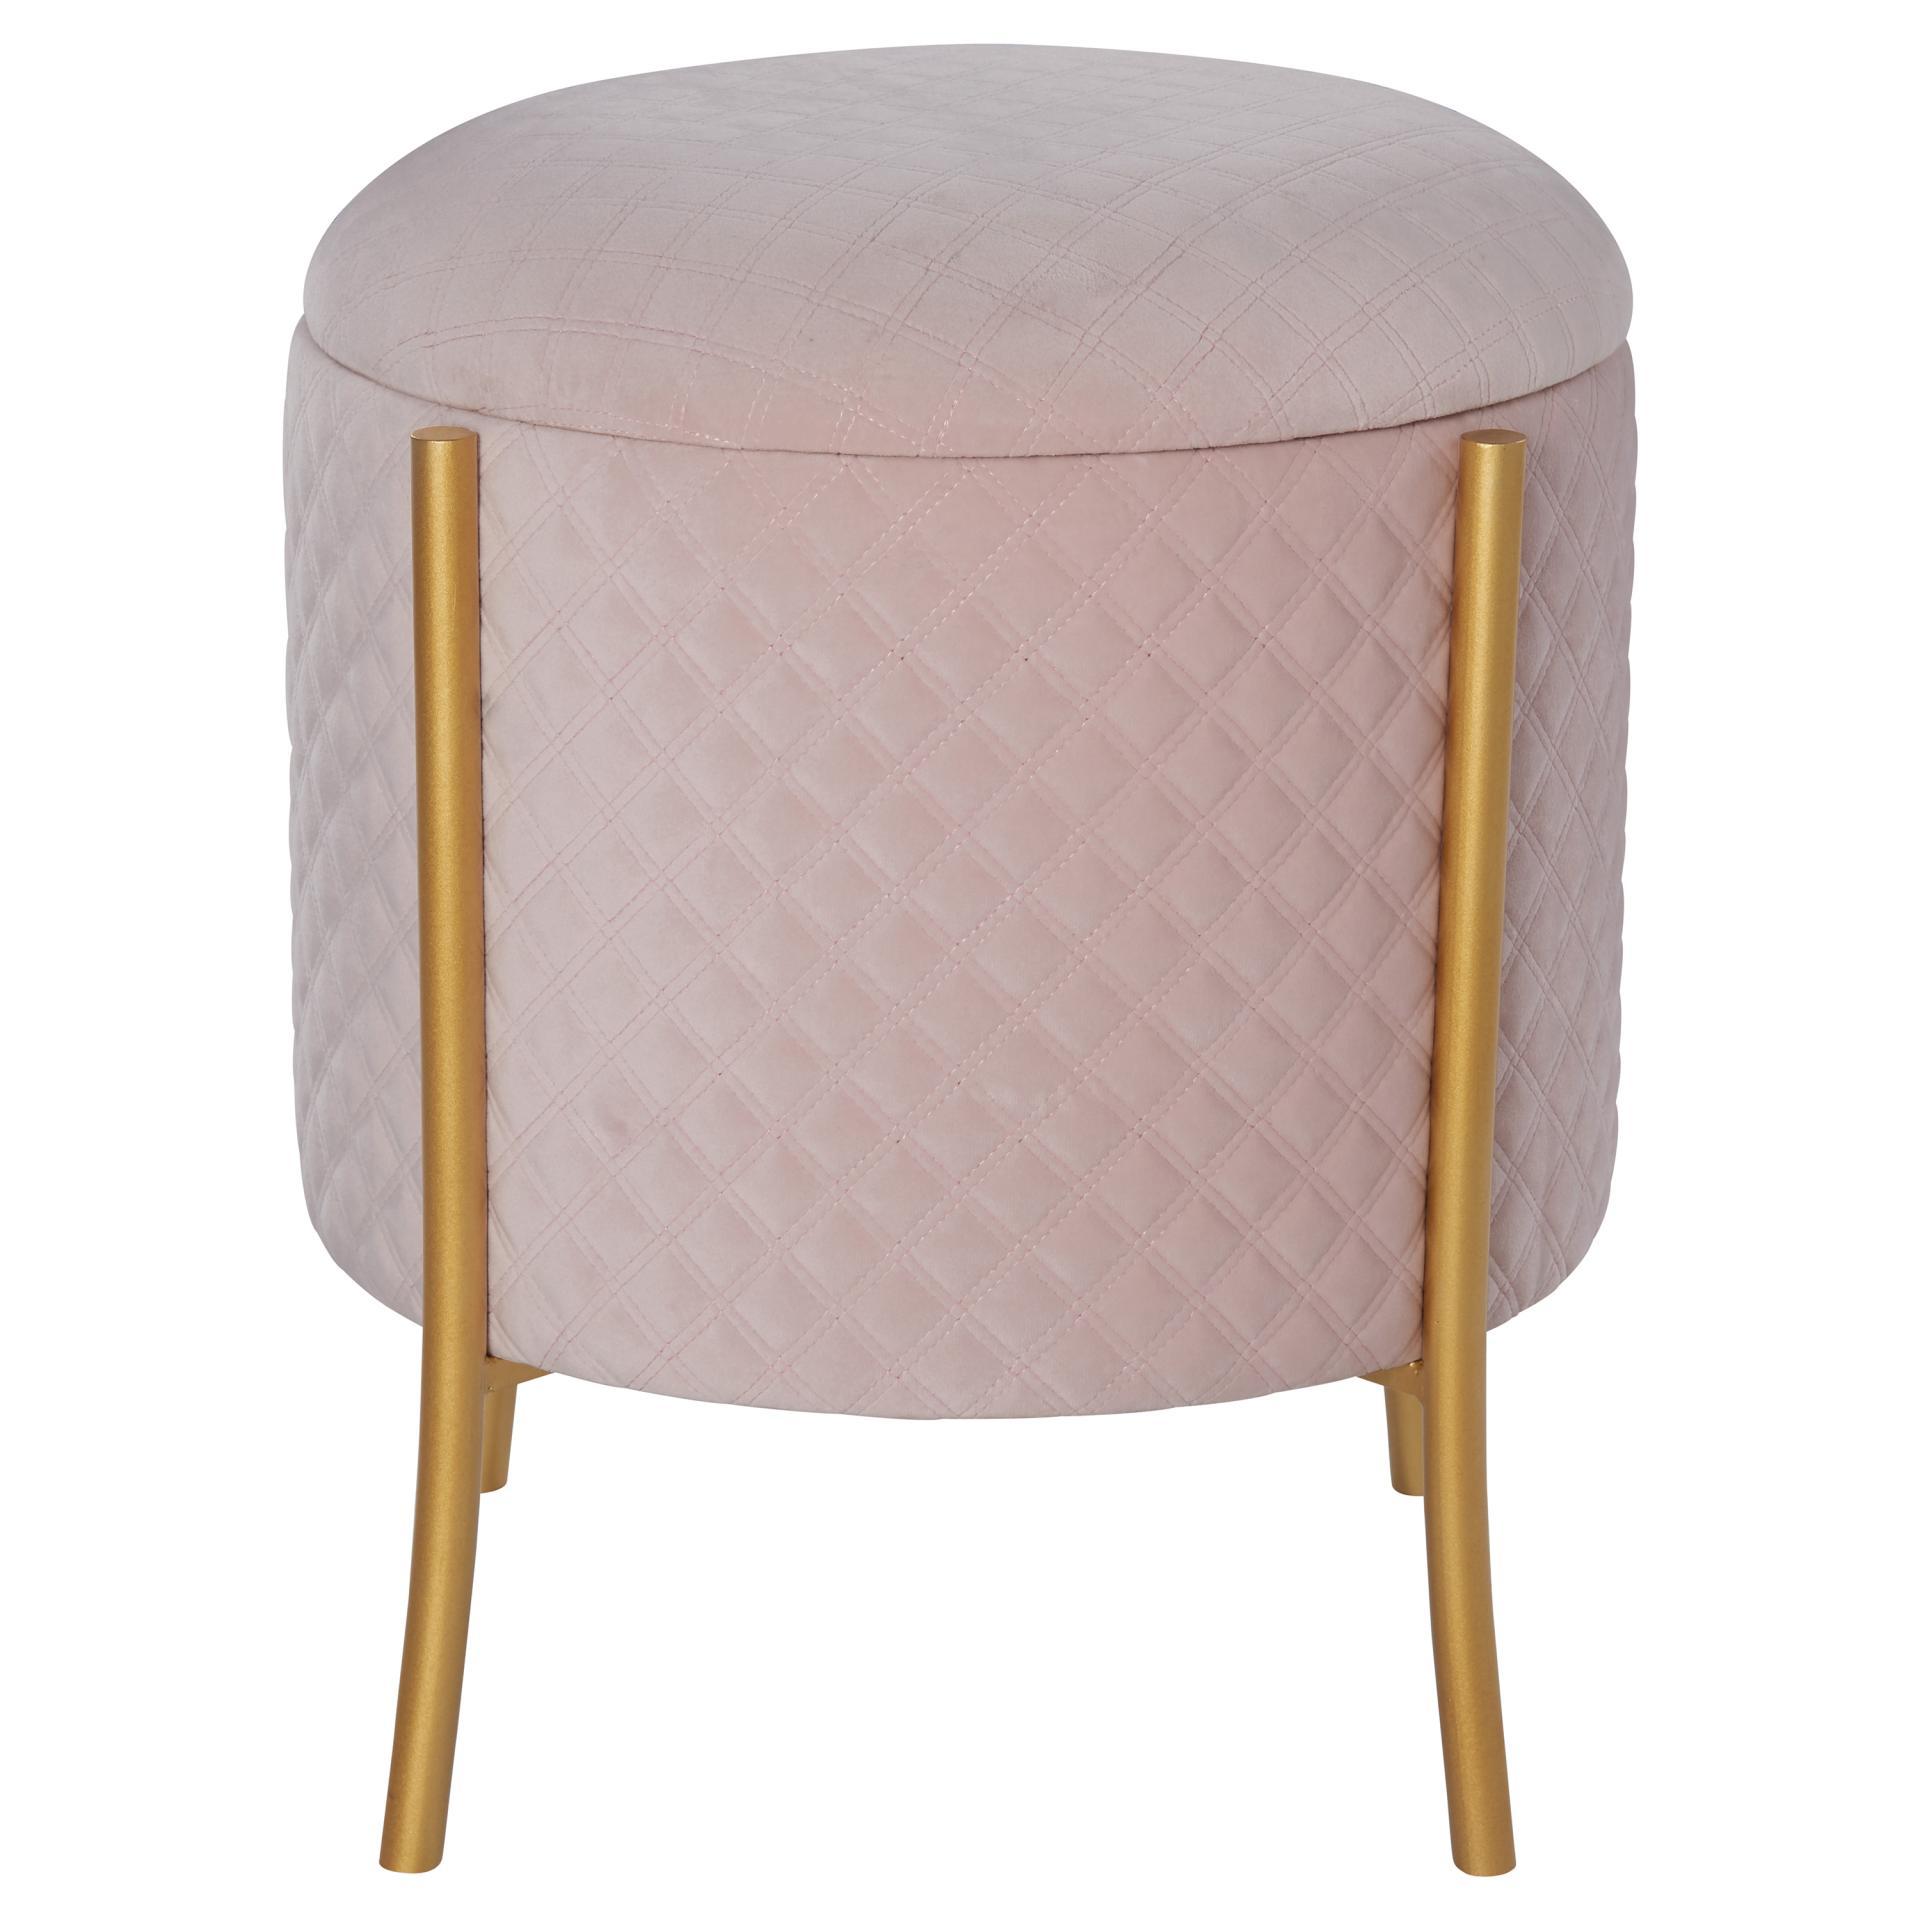 1600058 311 Npd Home Furniture Wholesale Lifestyle